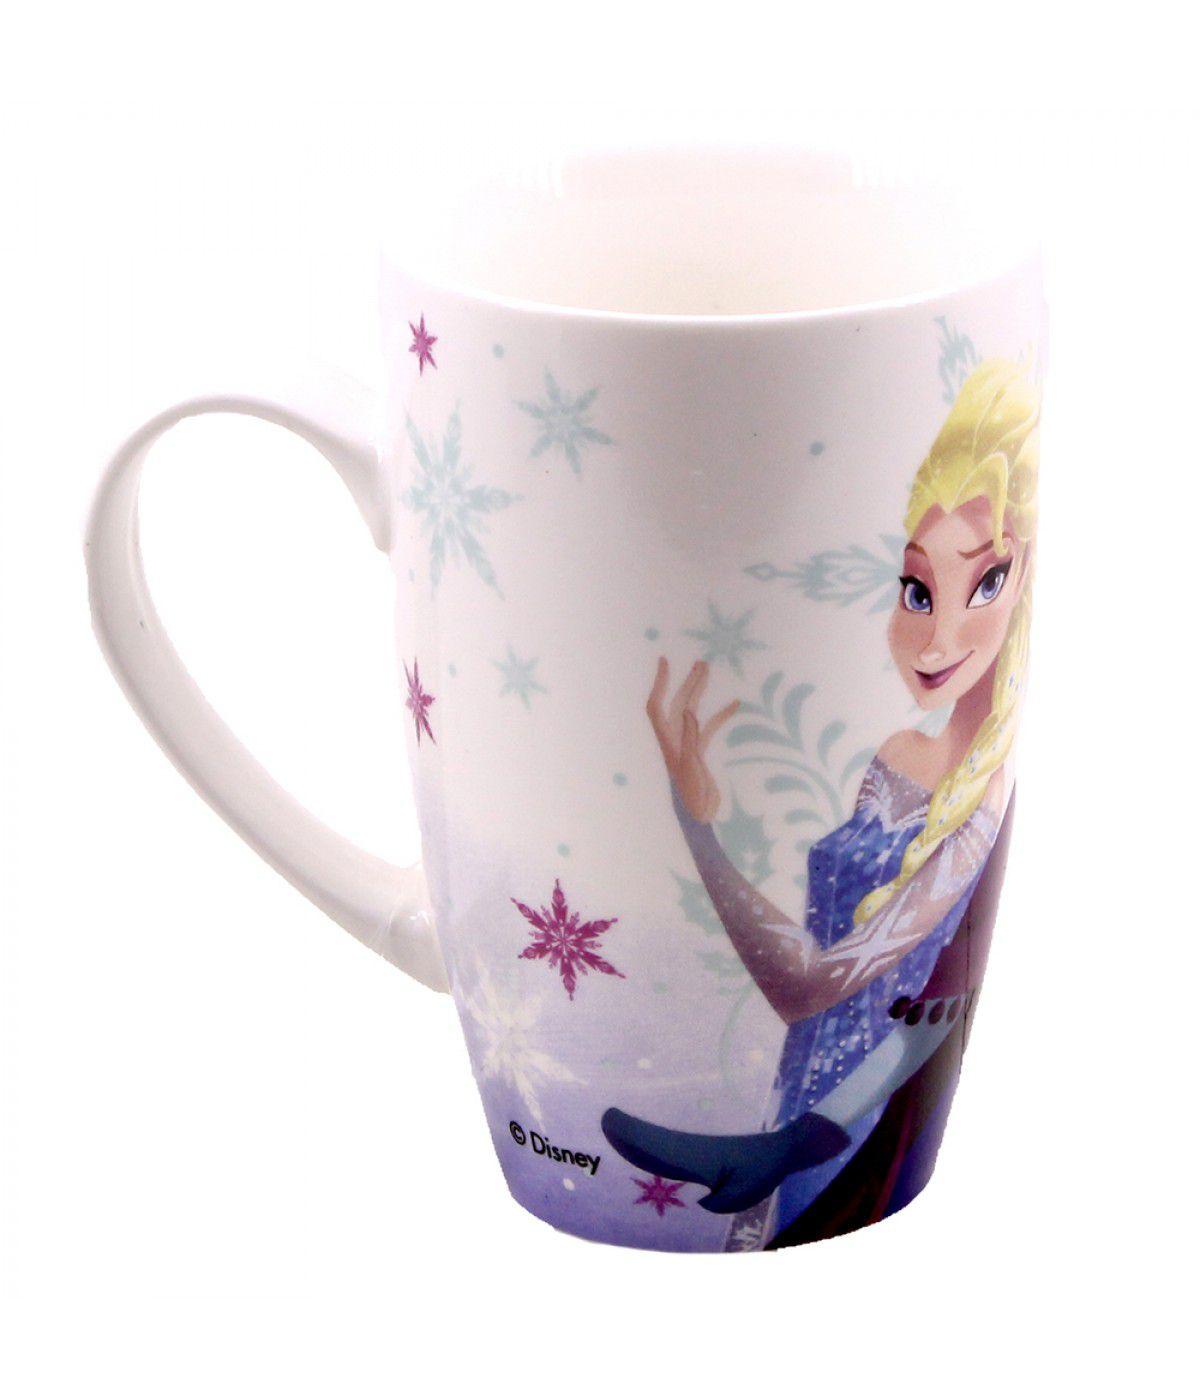 Caneca Porcelana Anna e Elsa: Frozen - 400ml